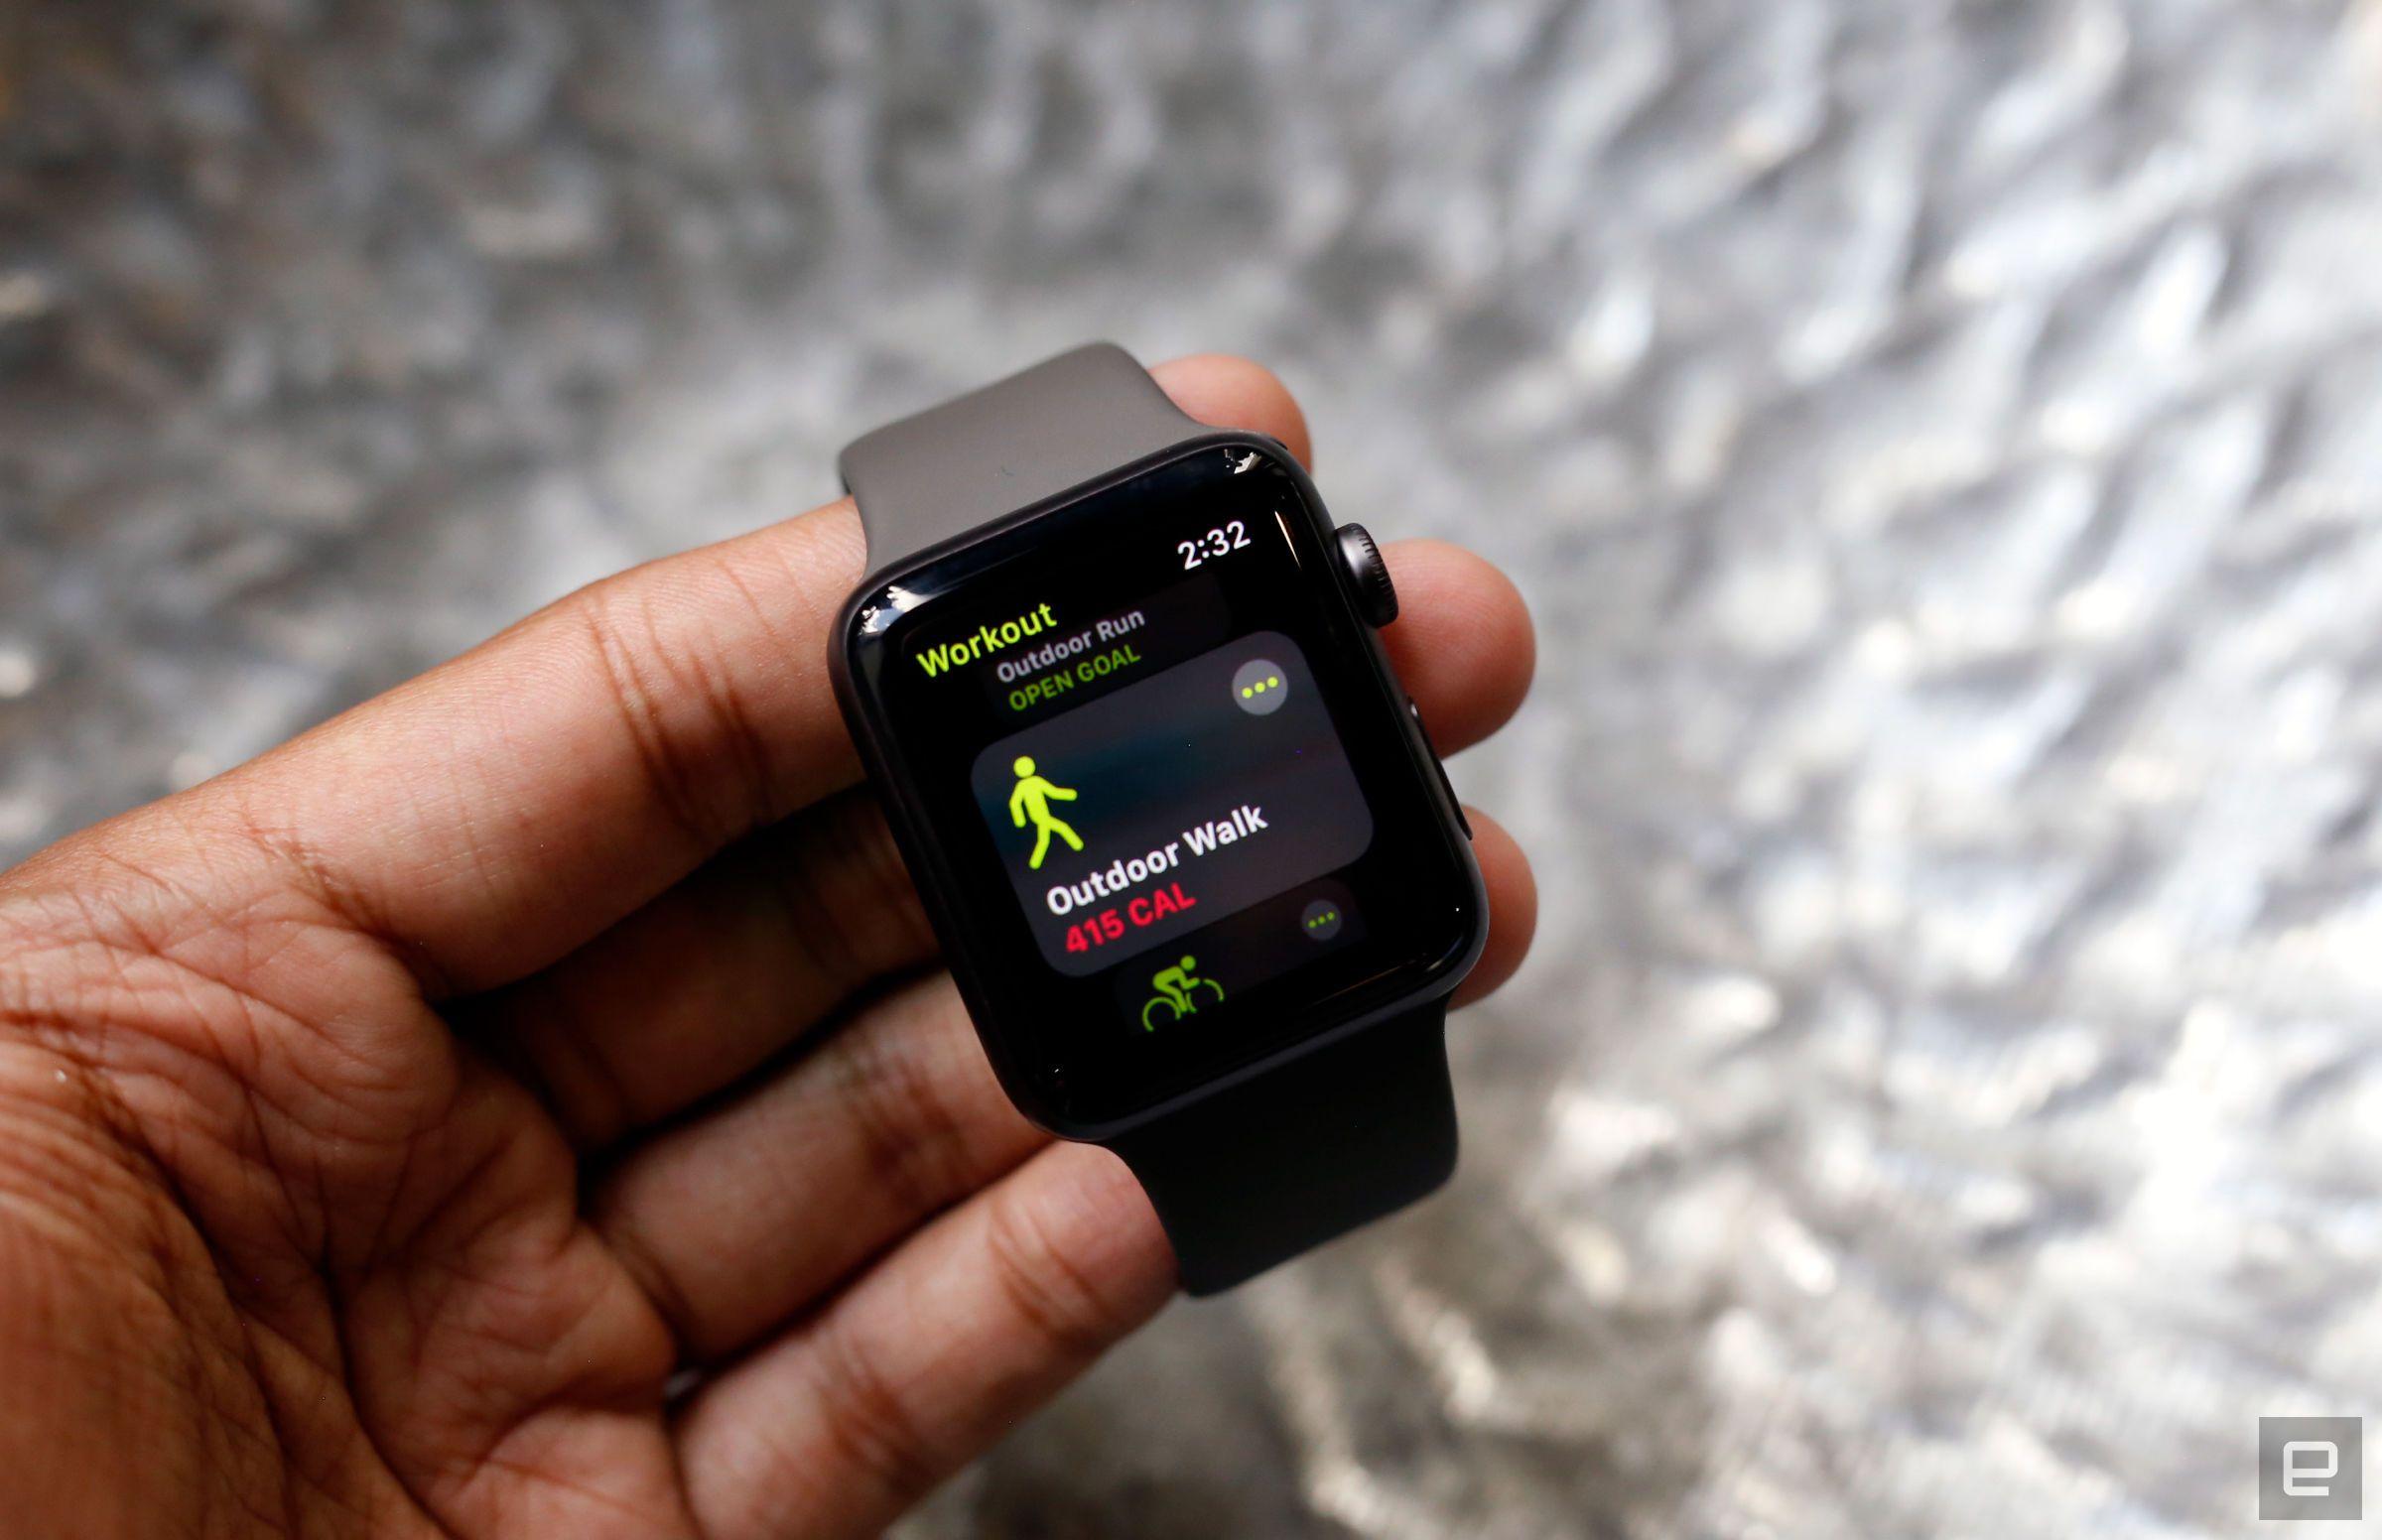 Life Insurer Offers Members A 25 Apple Watch If They Earn It